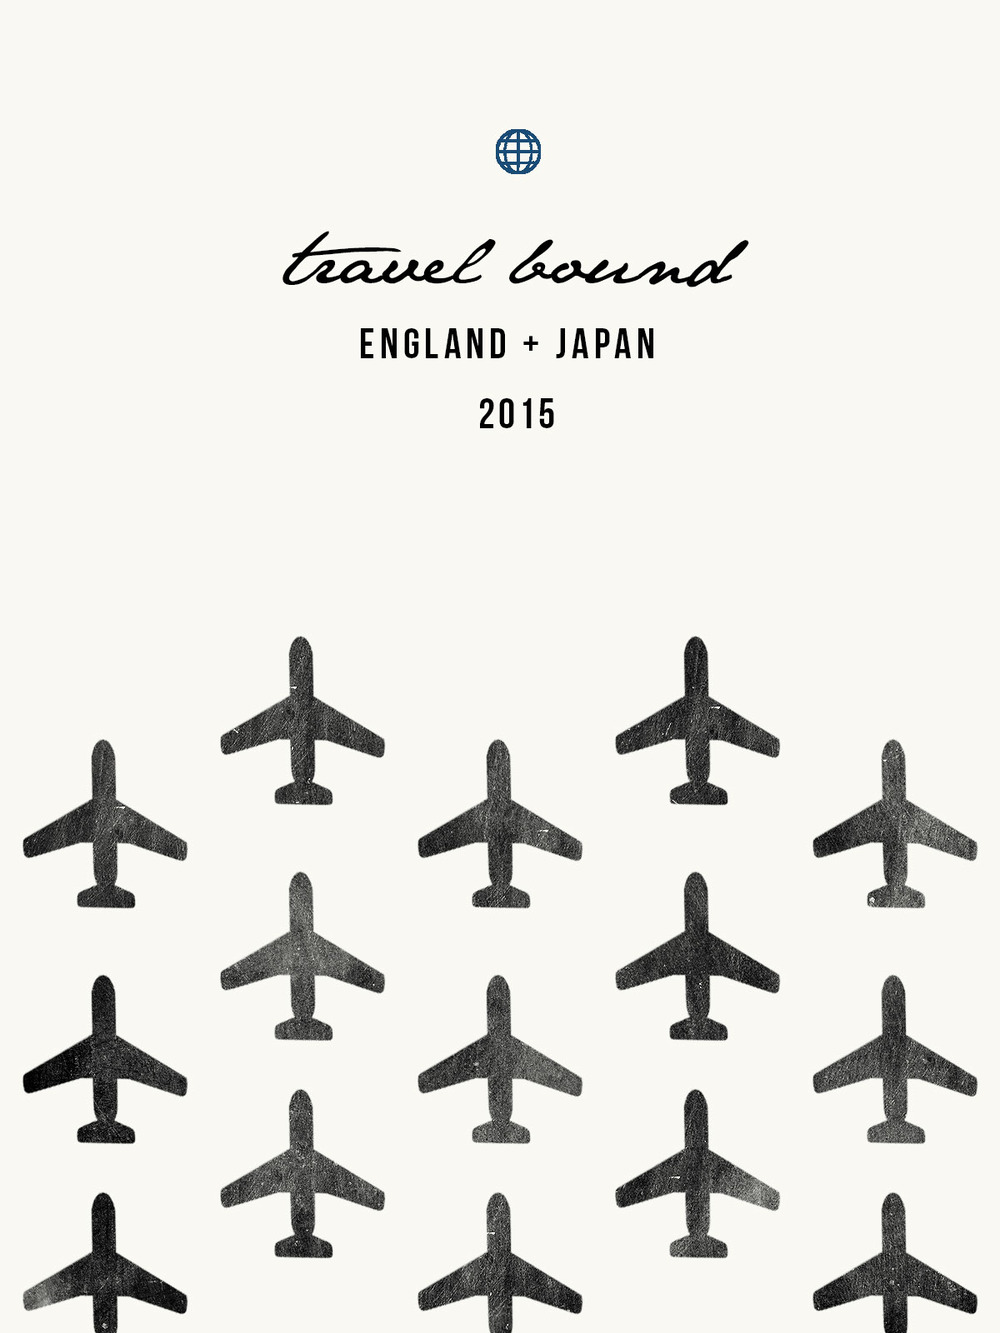 england+japan_retro poster